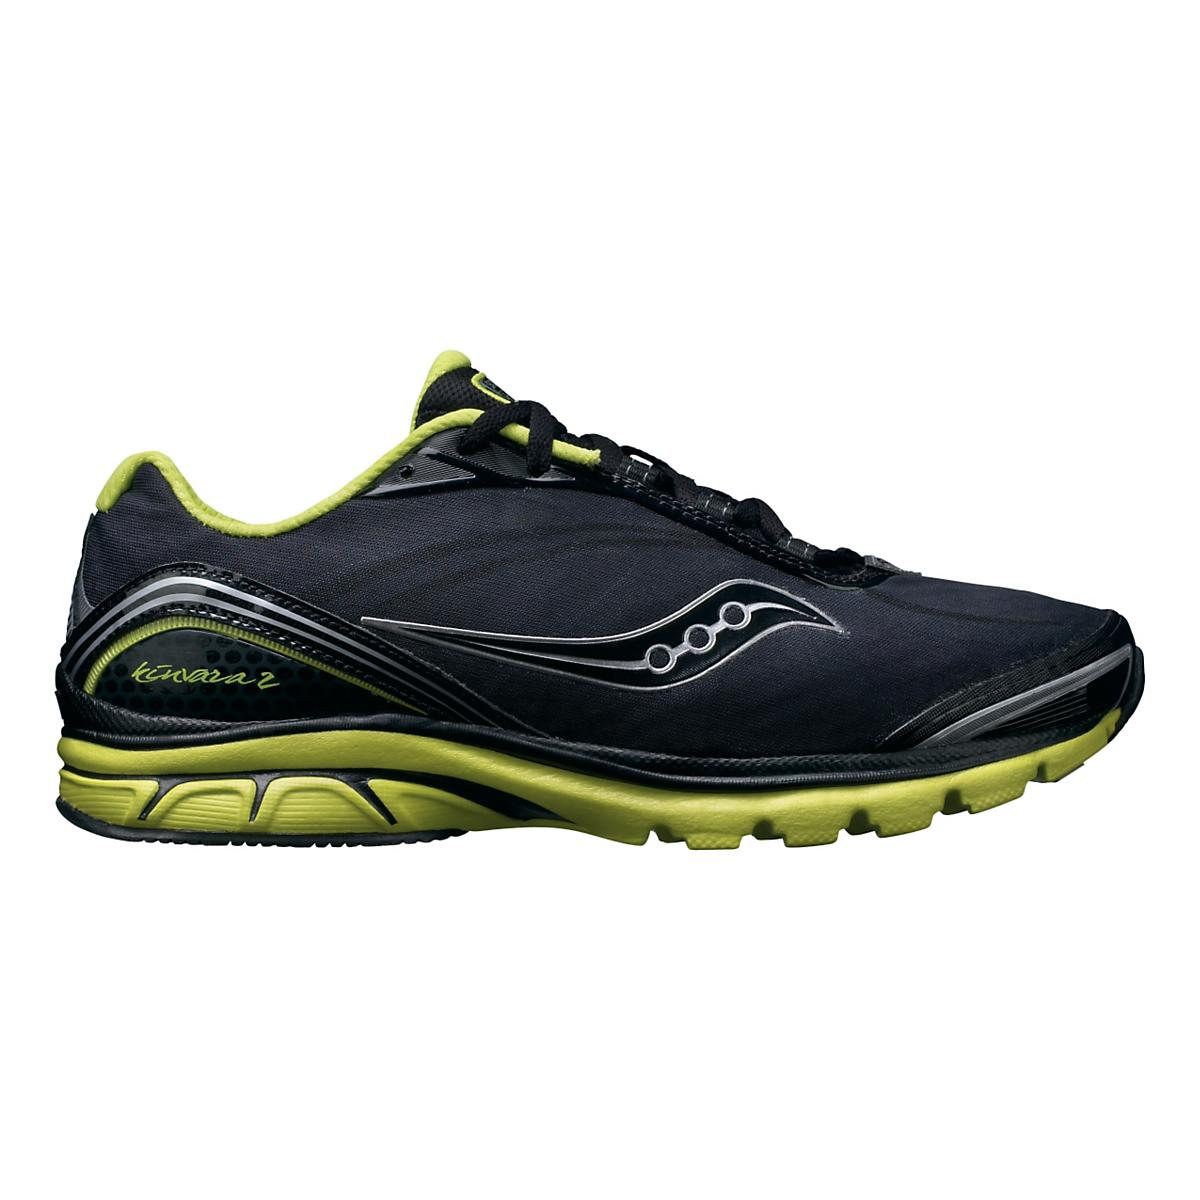 on sale ee397 f6776 Mens Saucony ProGrid Kinvara 2 Running Shoe at Road Runner Sports